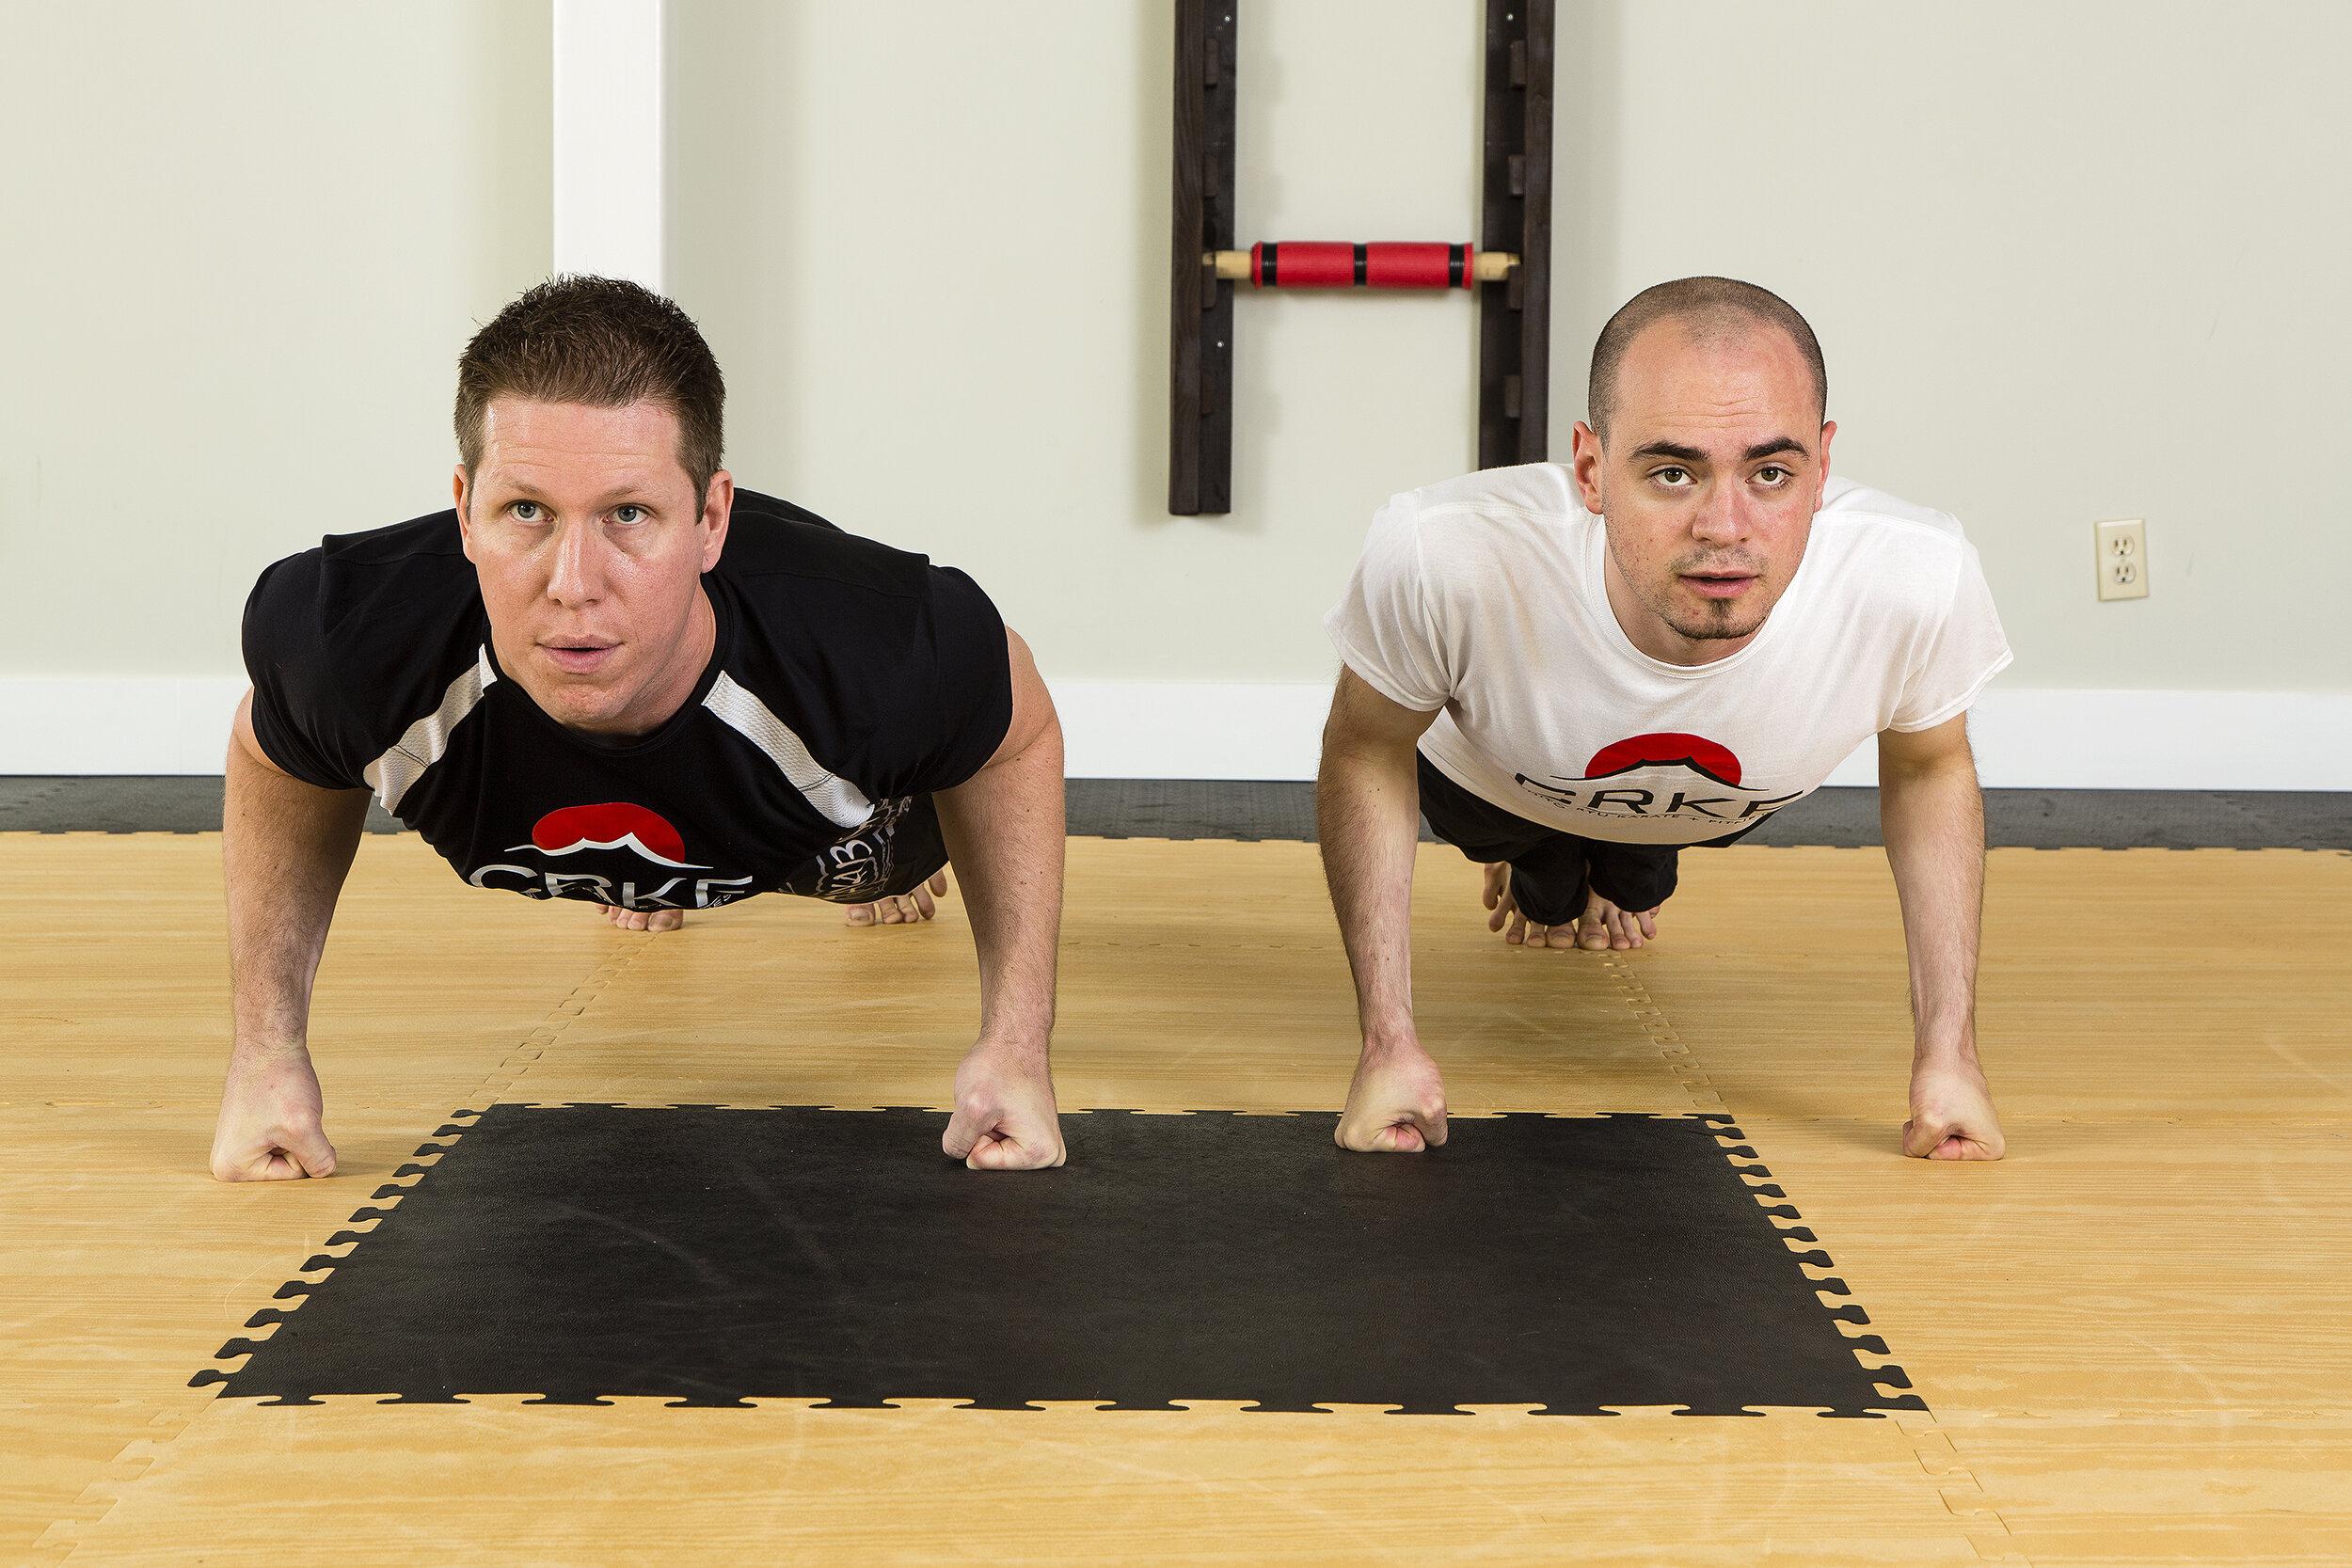 fitness - Push Ups